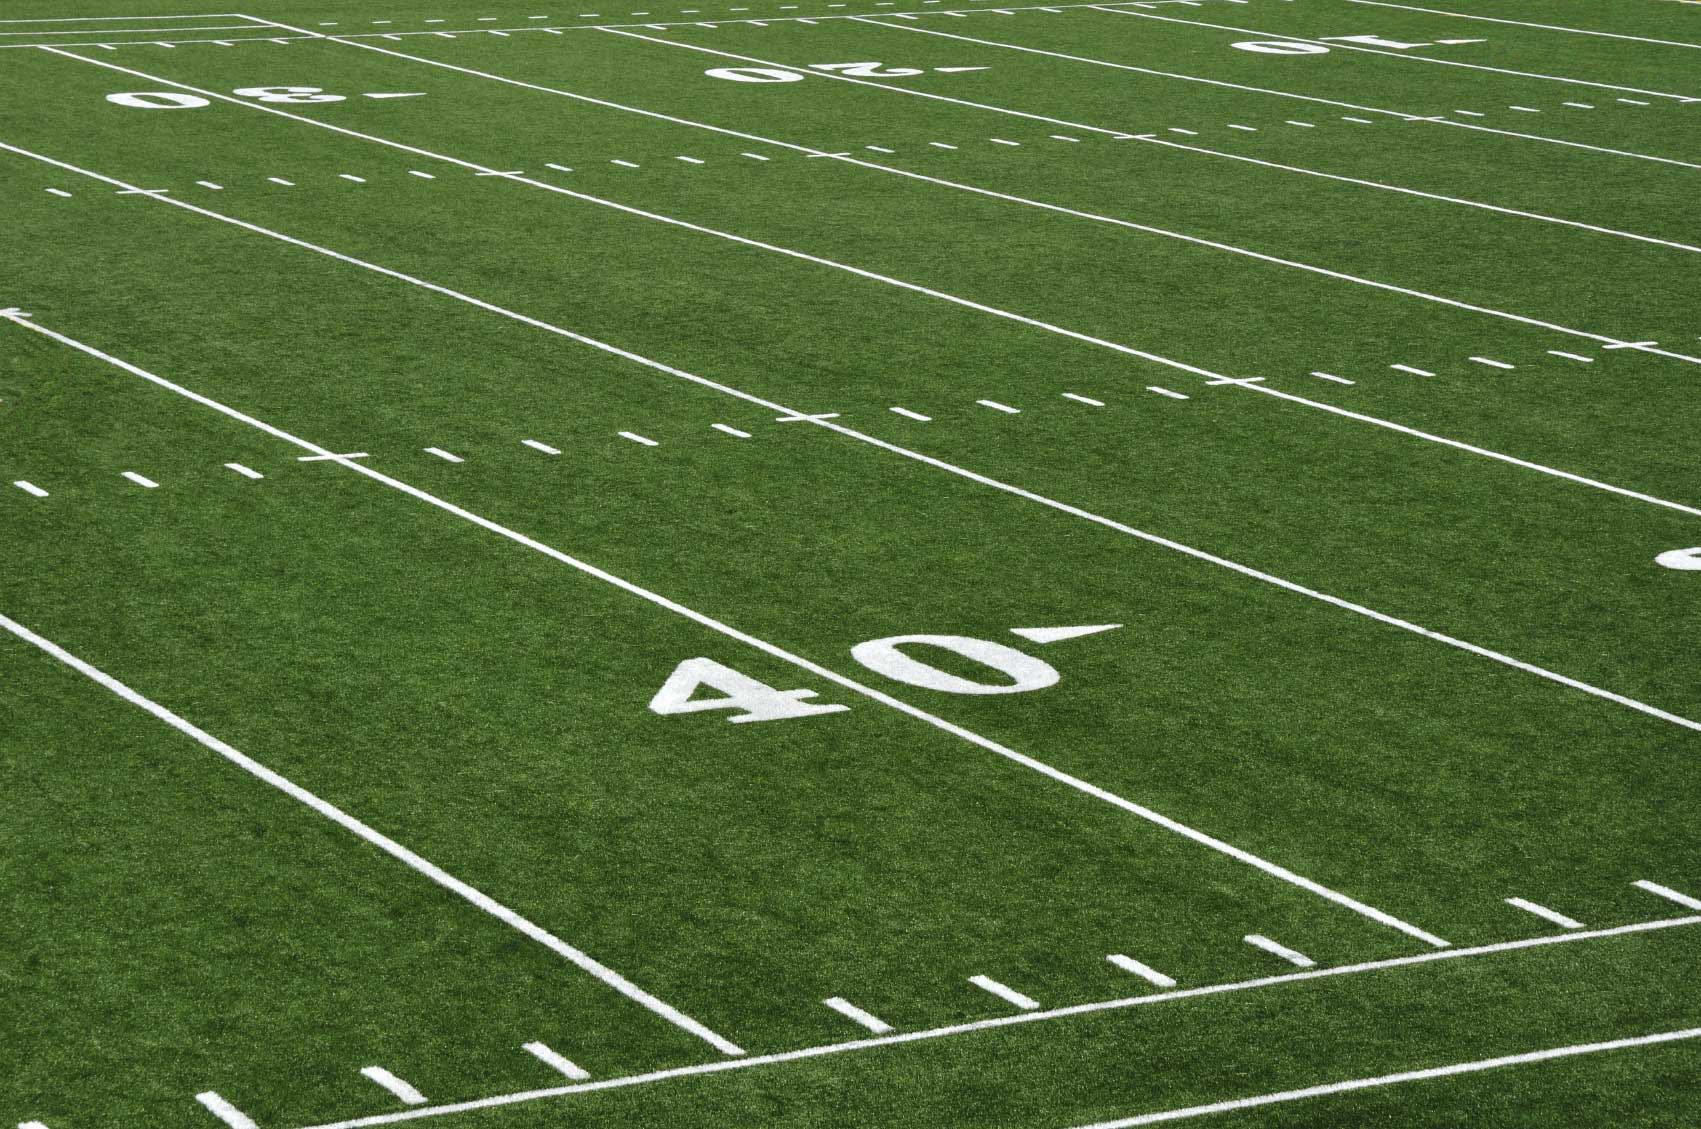 Football Backgrounds For Photoshop imagebasketnet 1701x1129